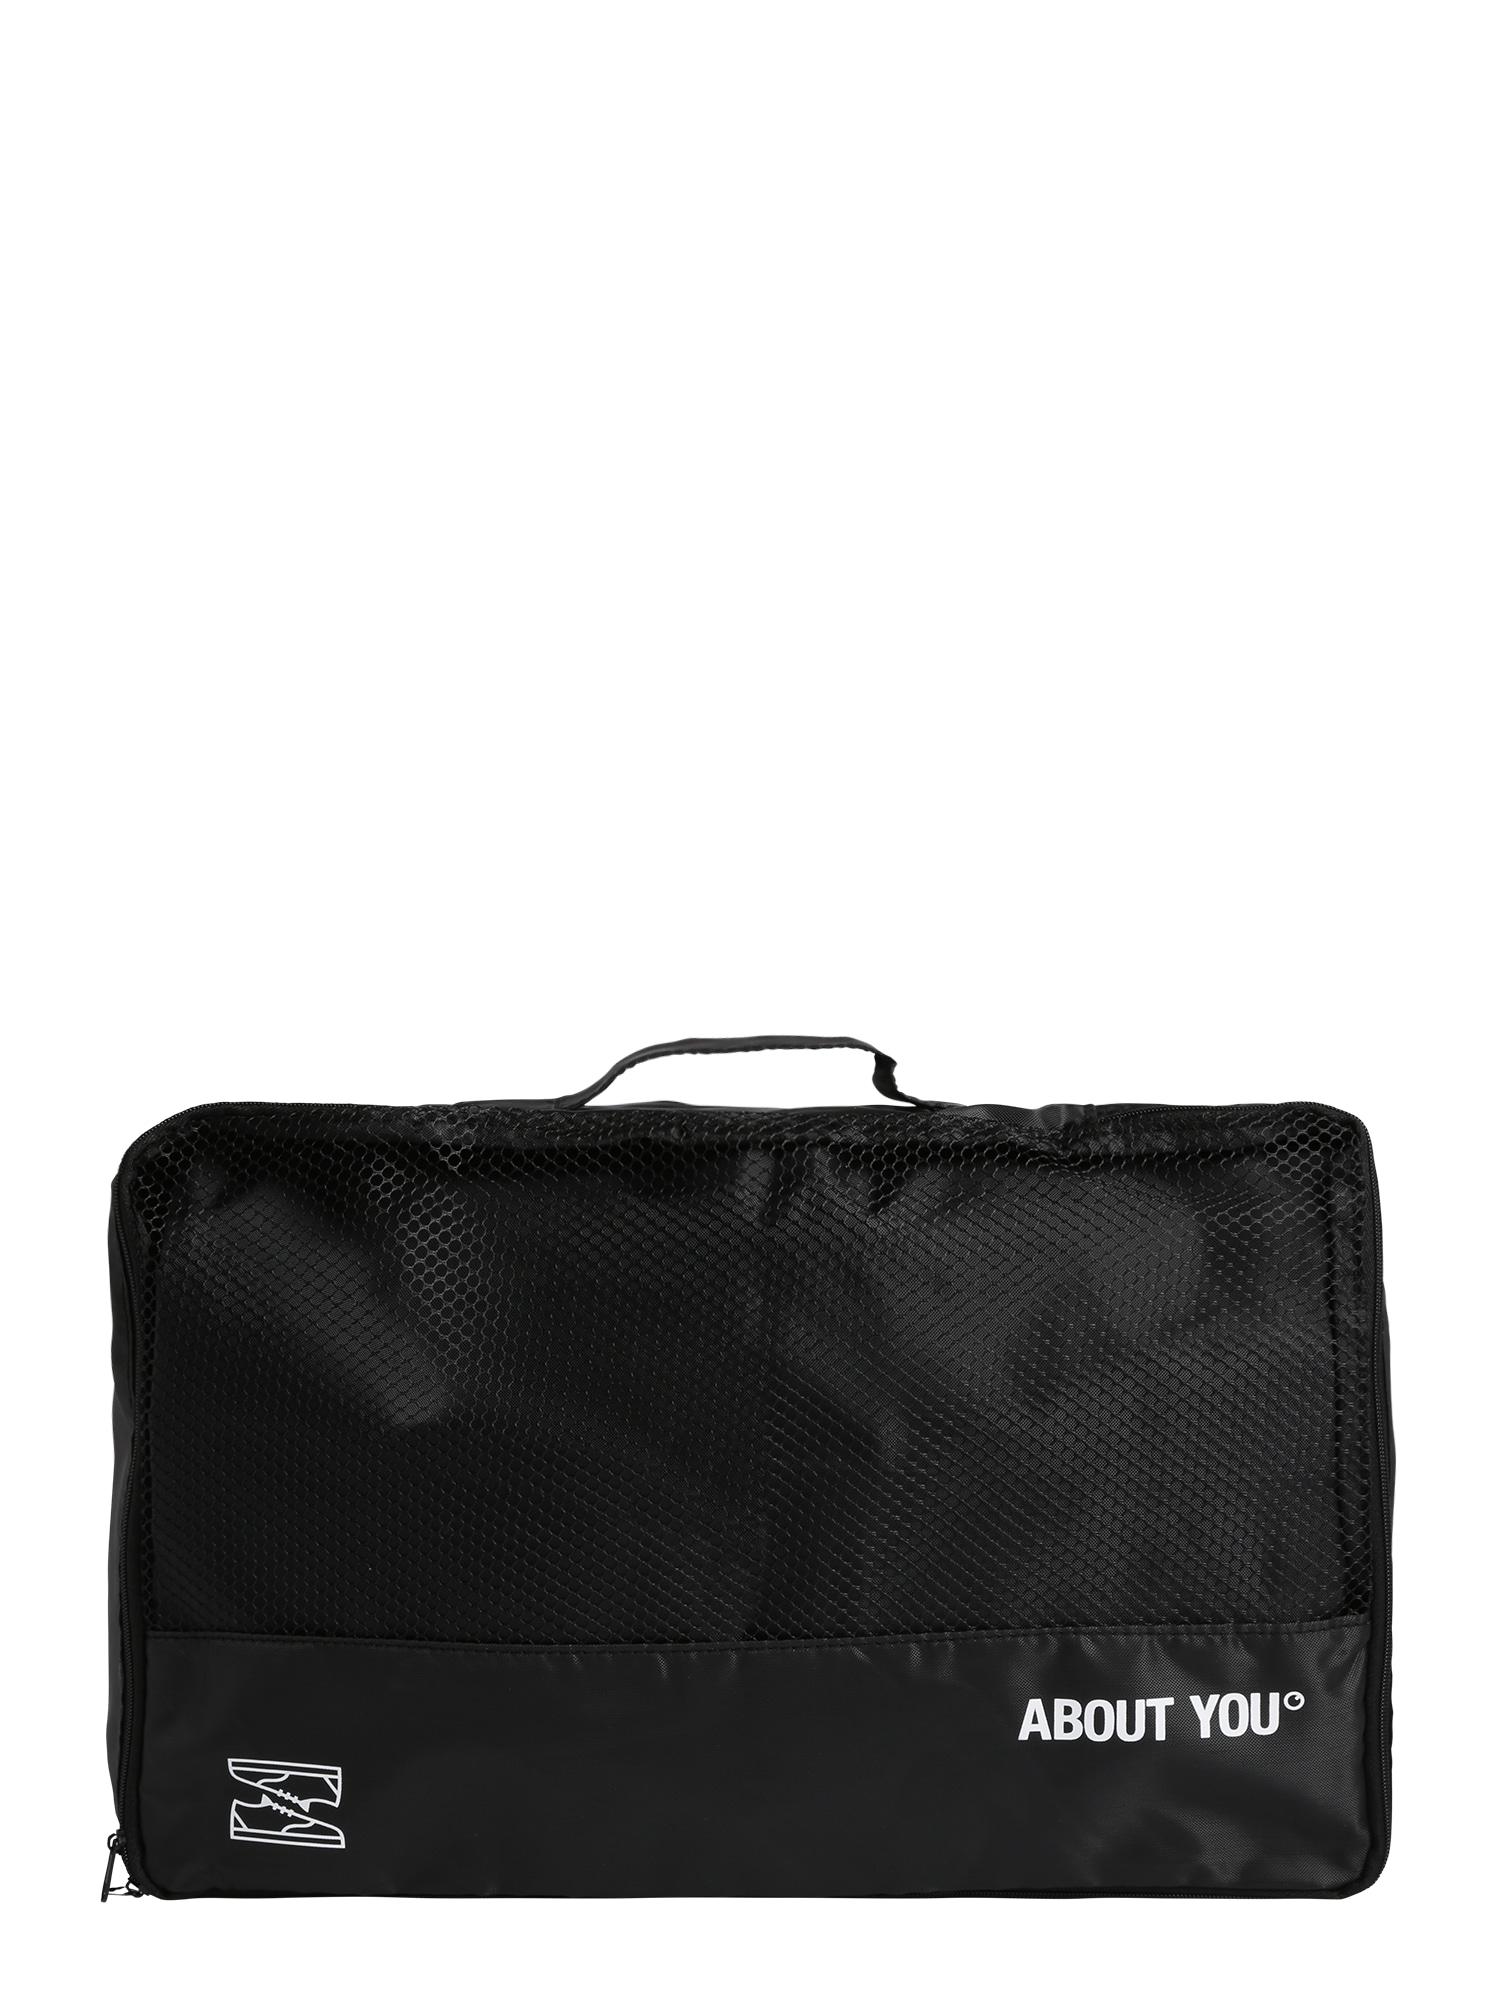 ABOUT YOU Kelioninis krepšys 'Icons' juoda